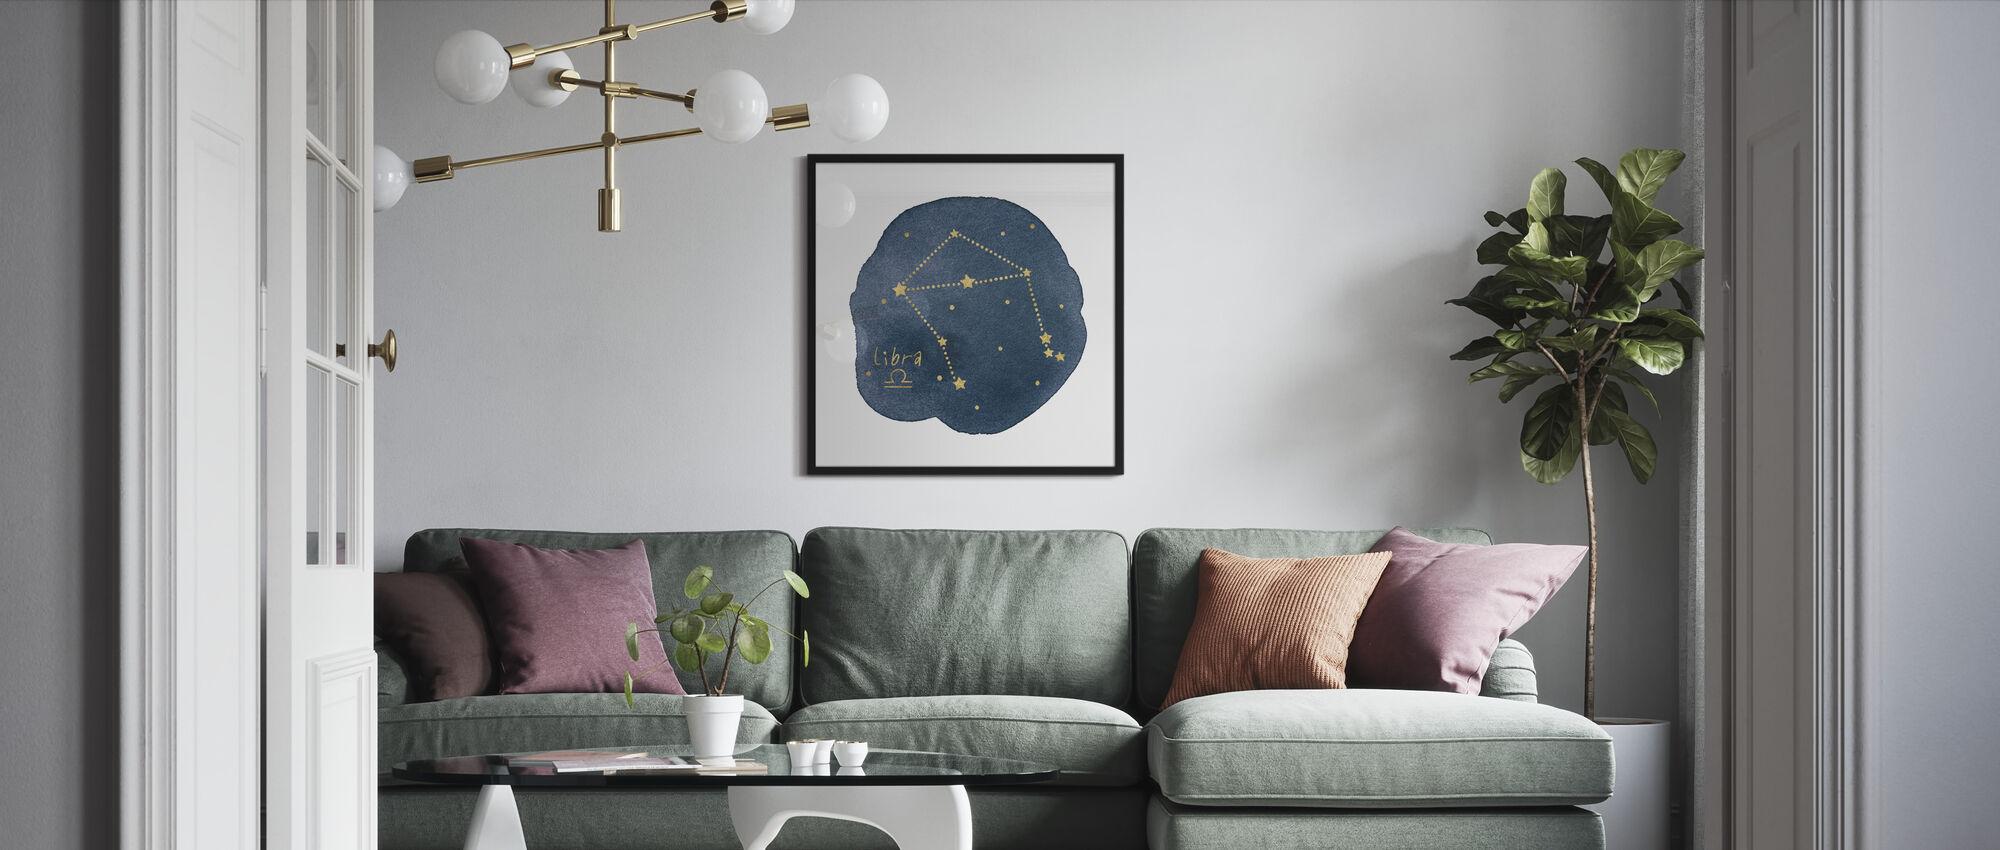 Horoskop Vekten - Innrammet bilde - Stue